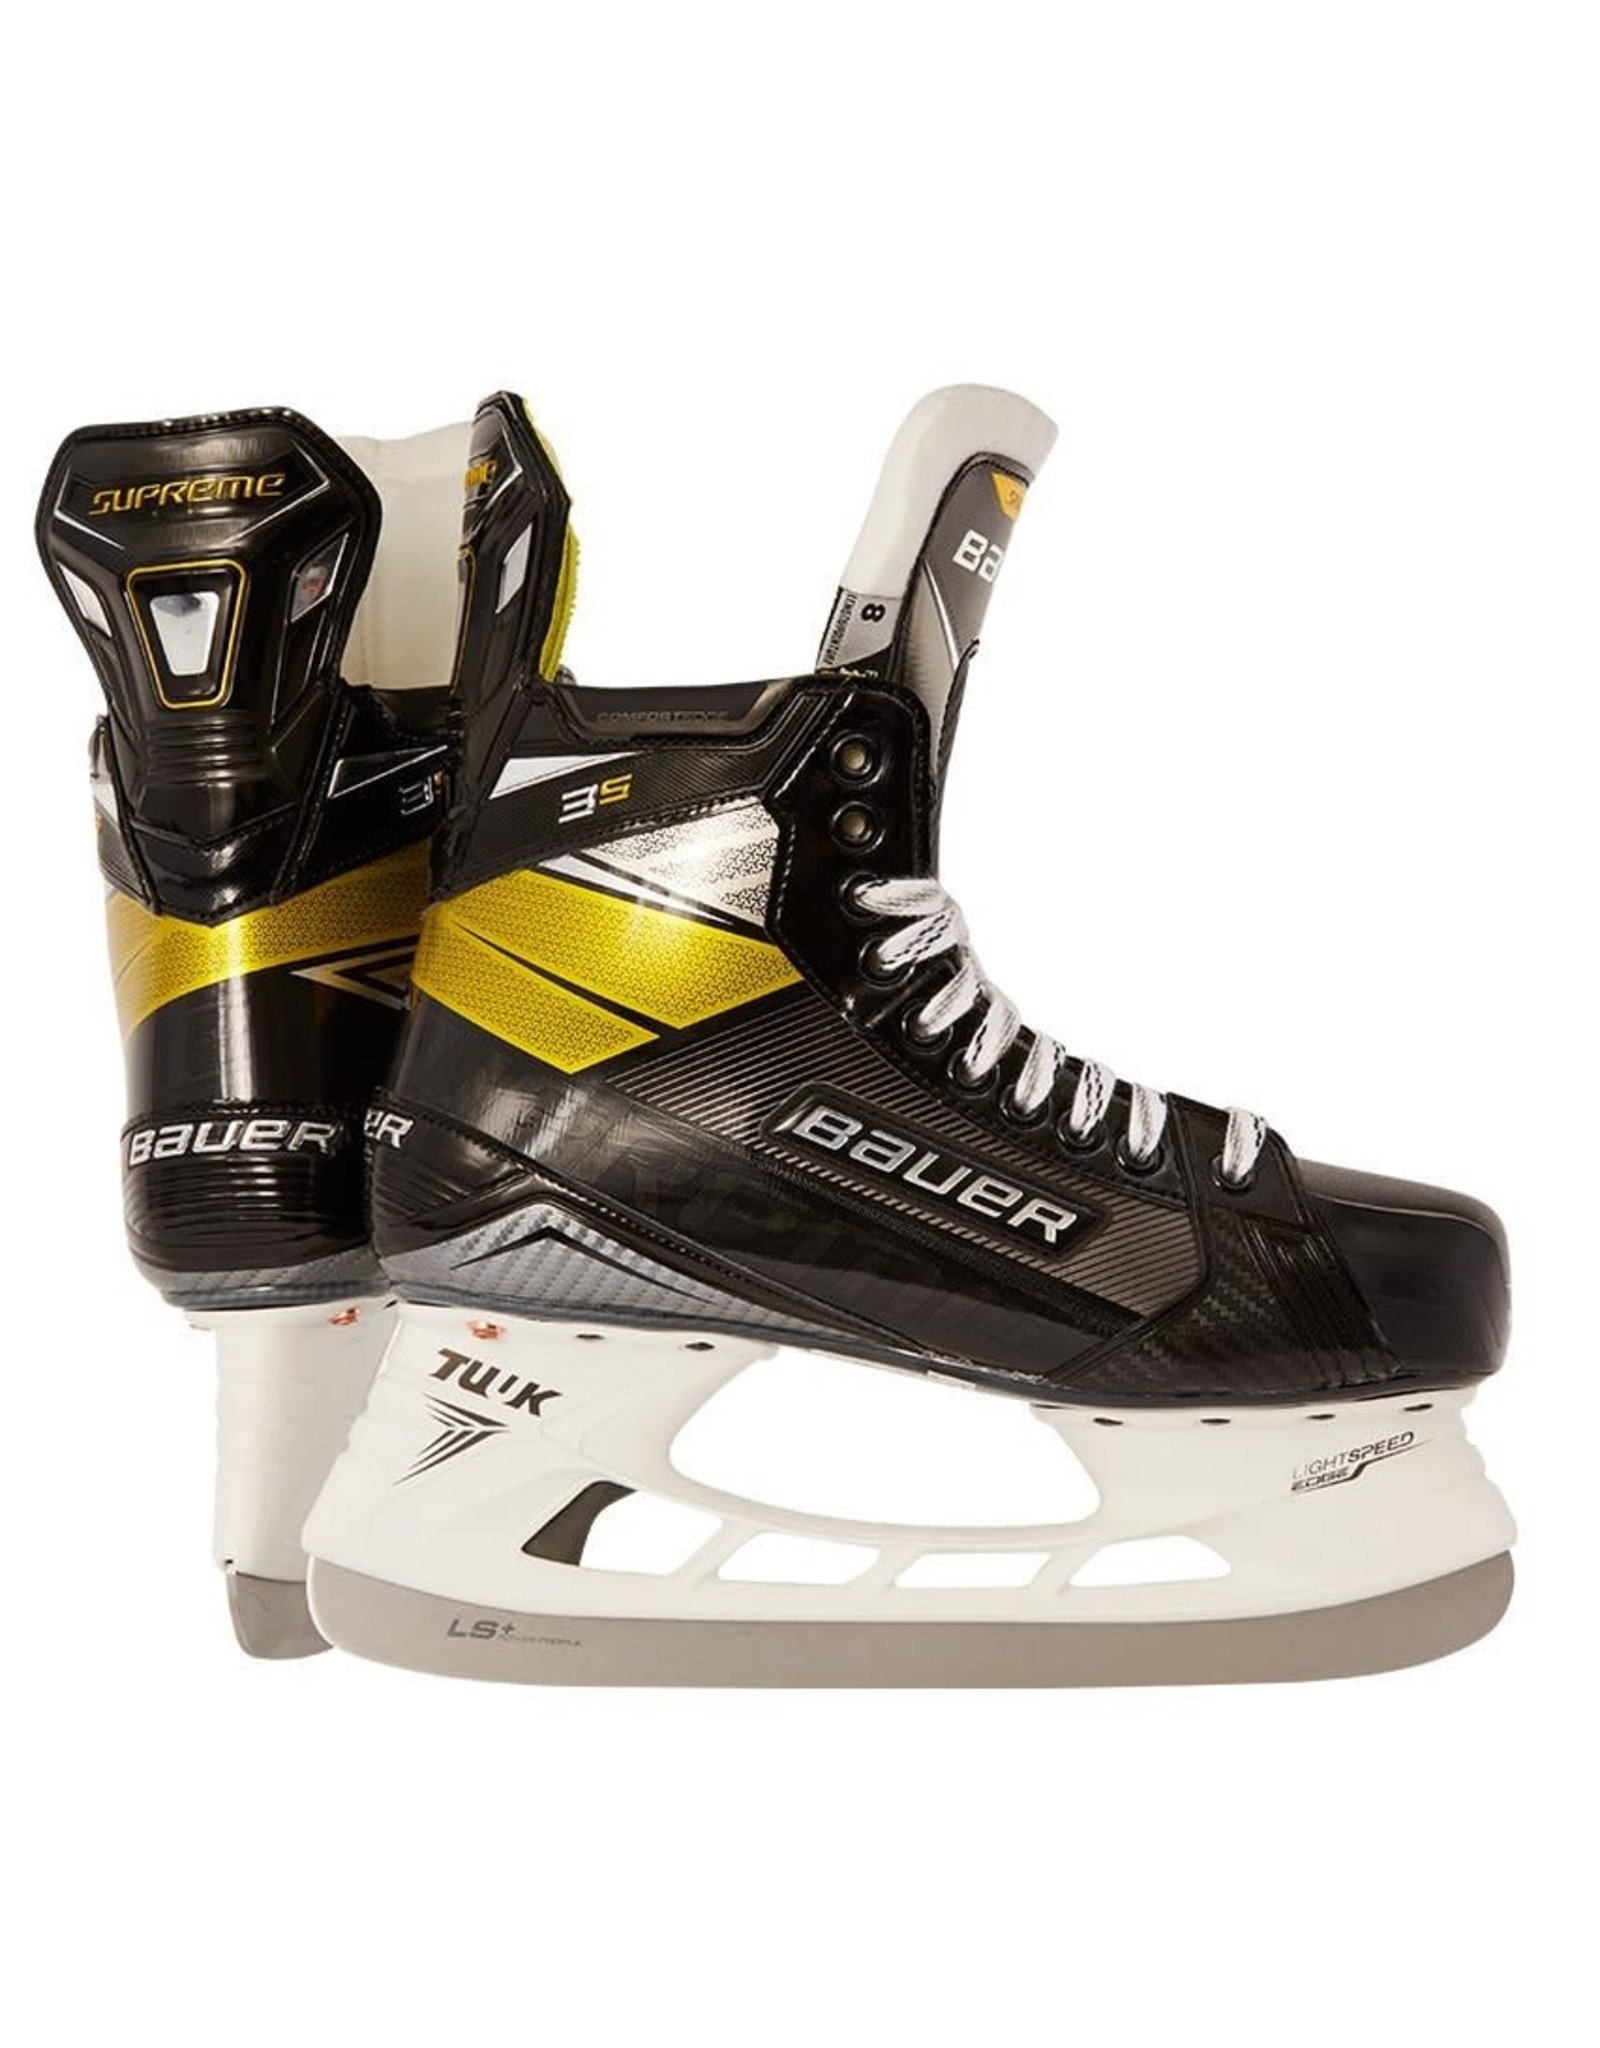 BAUER Supreme 3S, Senior Hockey Skate